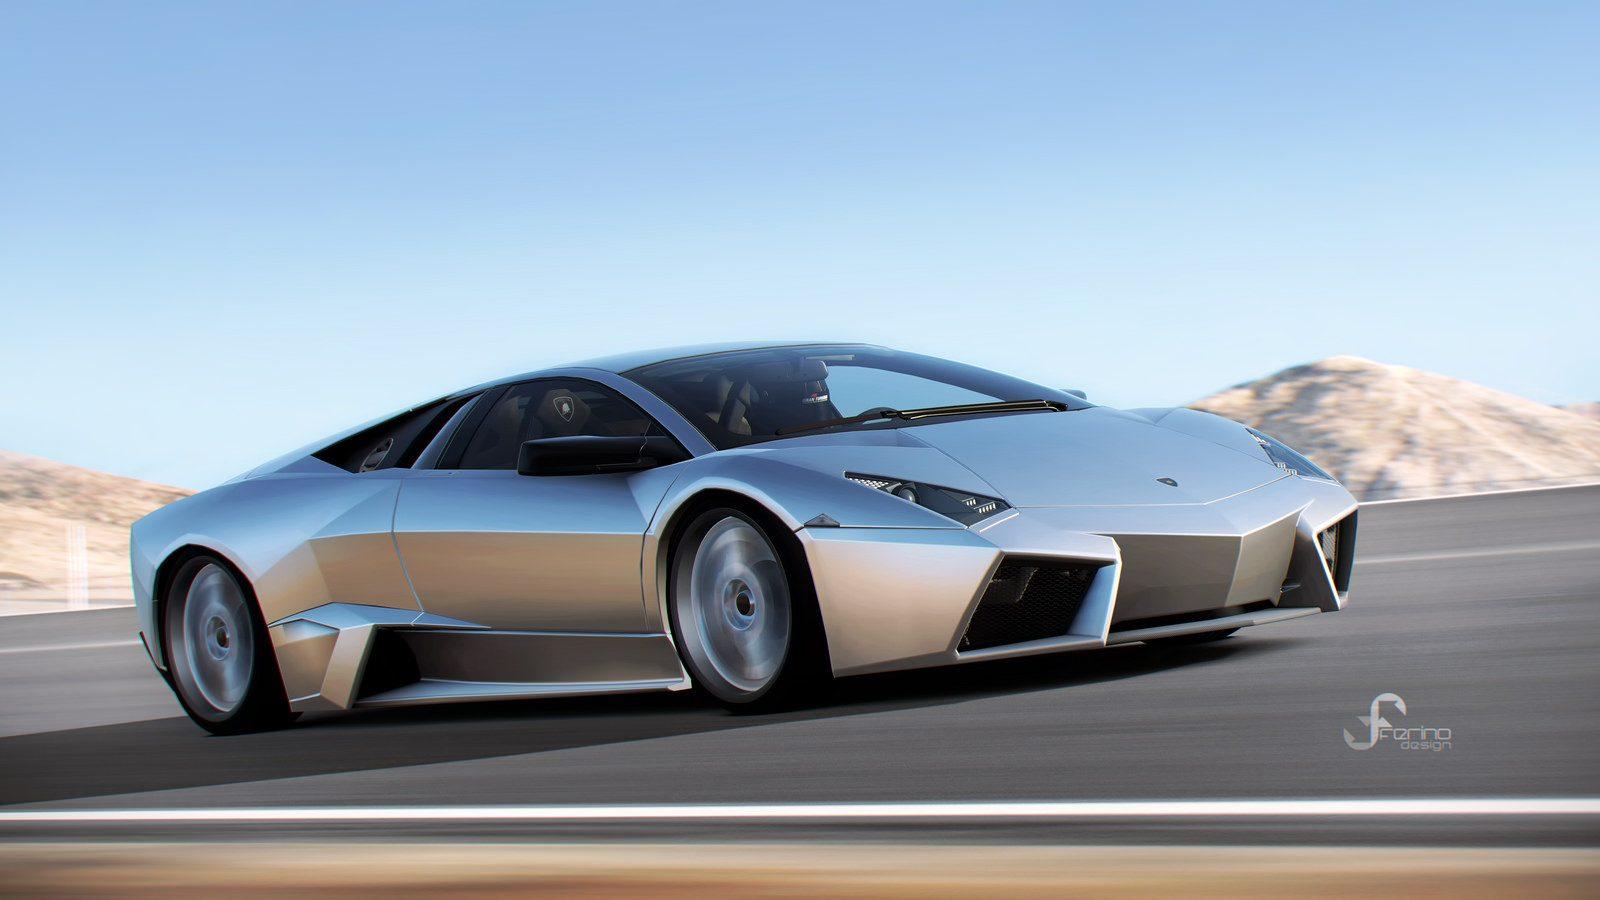 Image, Futuristic car.